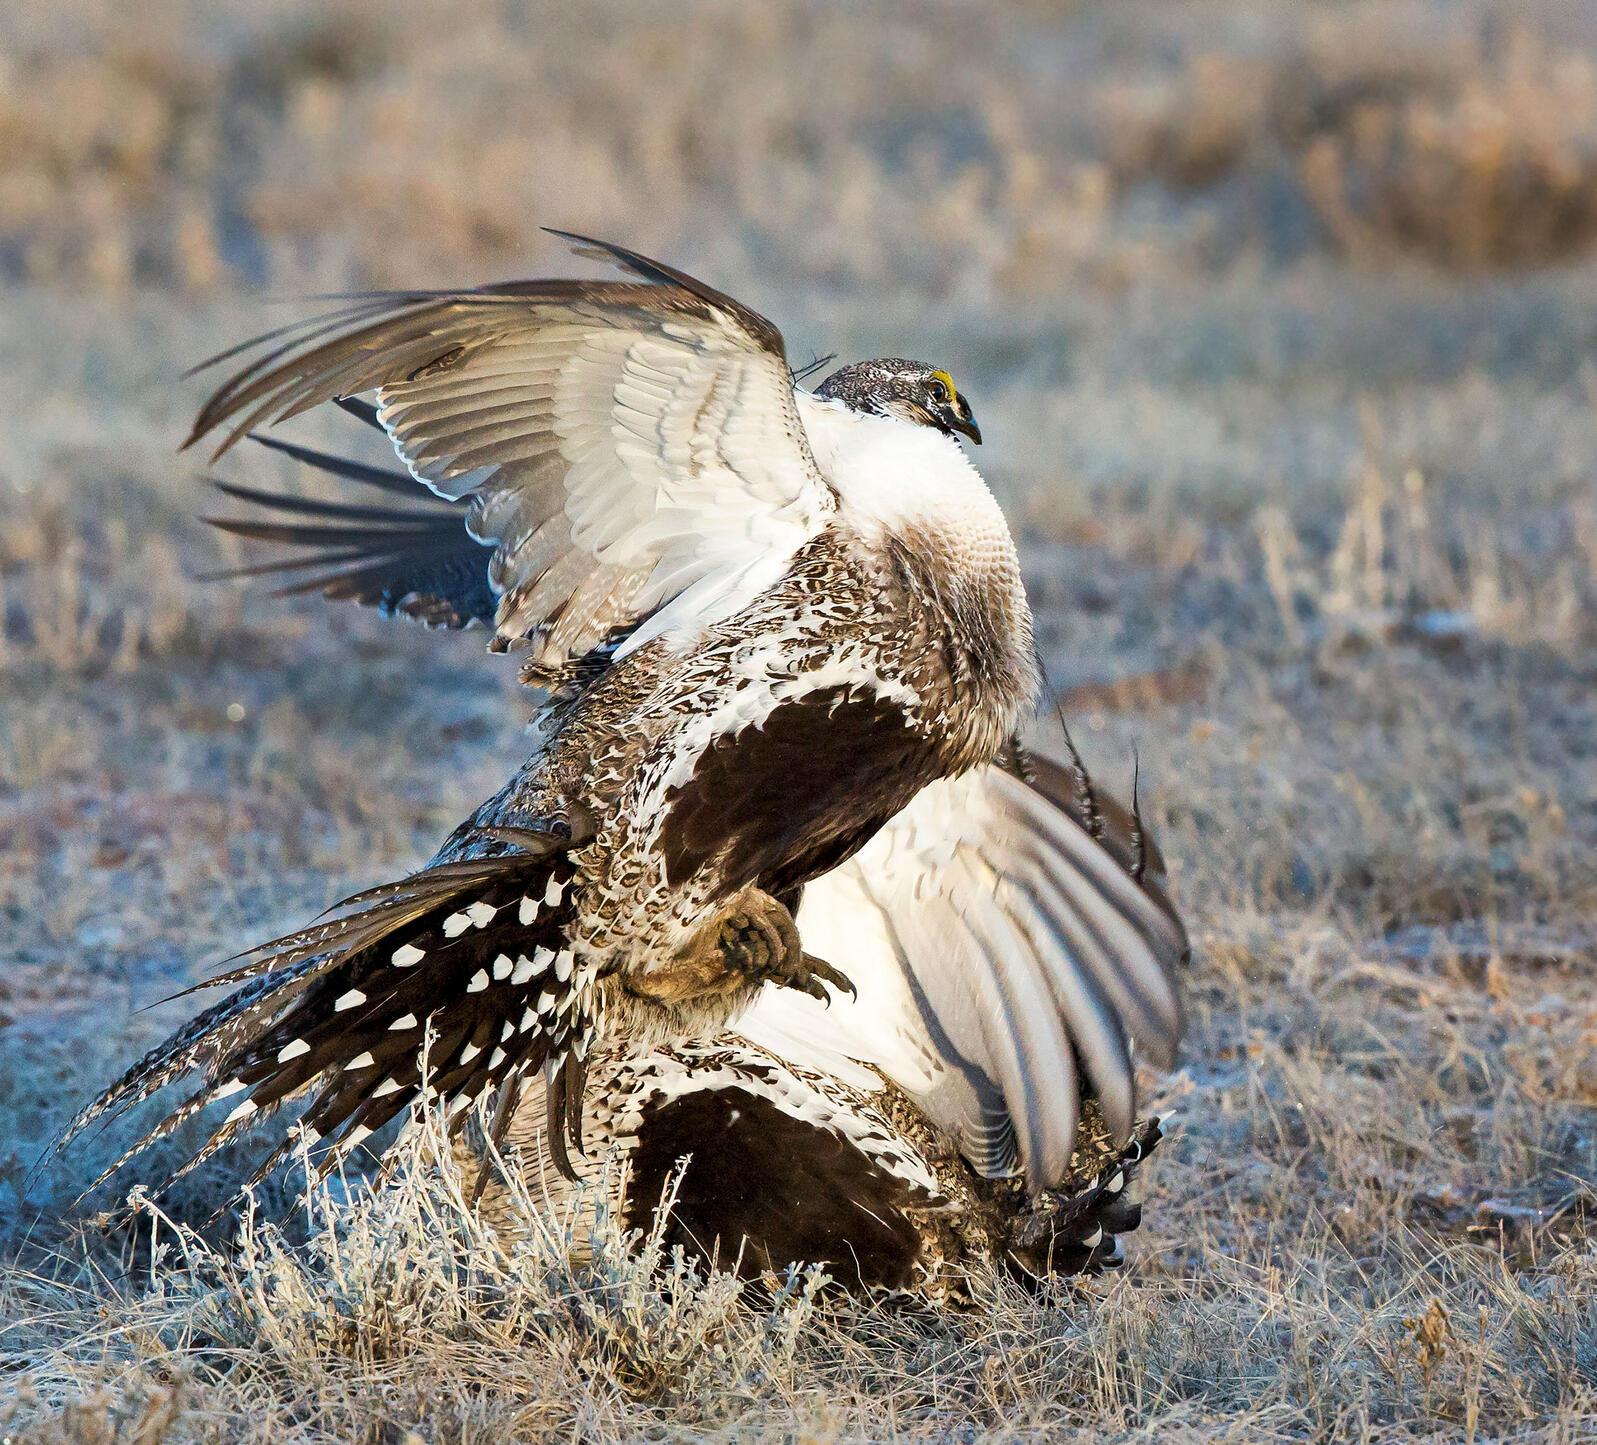 Greater Sage-Grouse. Odalys Muñoz Gonzalez/Audubon Photography Awards